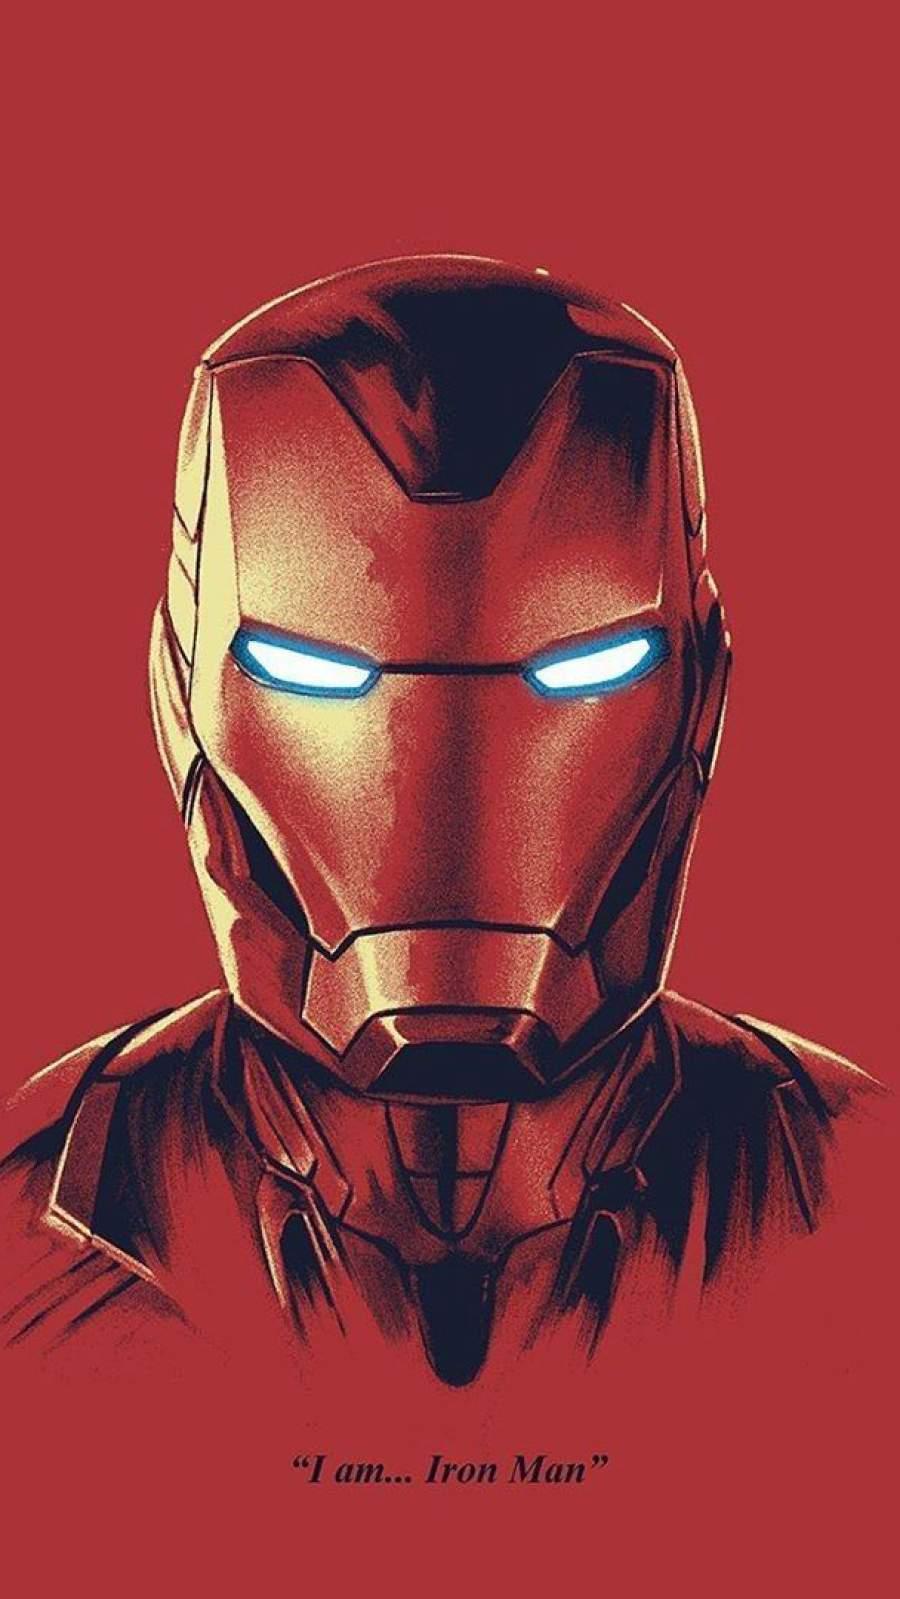 I am Iron Man Mark 85 Armor iPhone Wallpaper